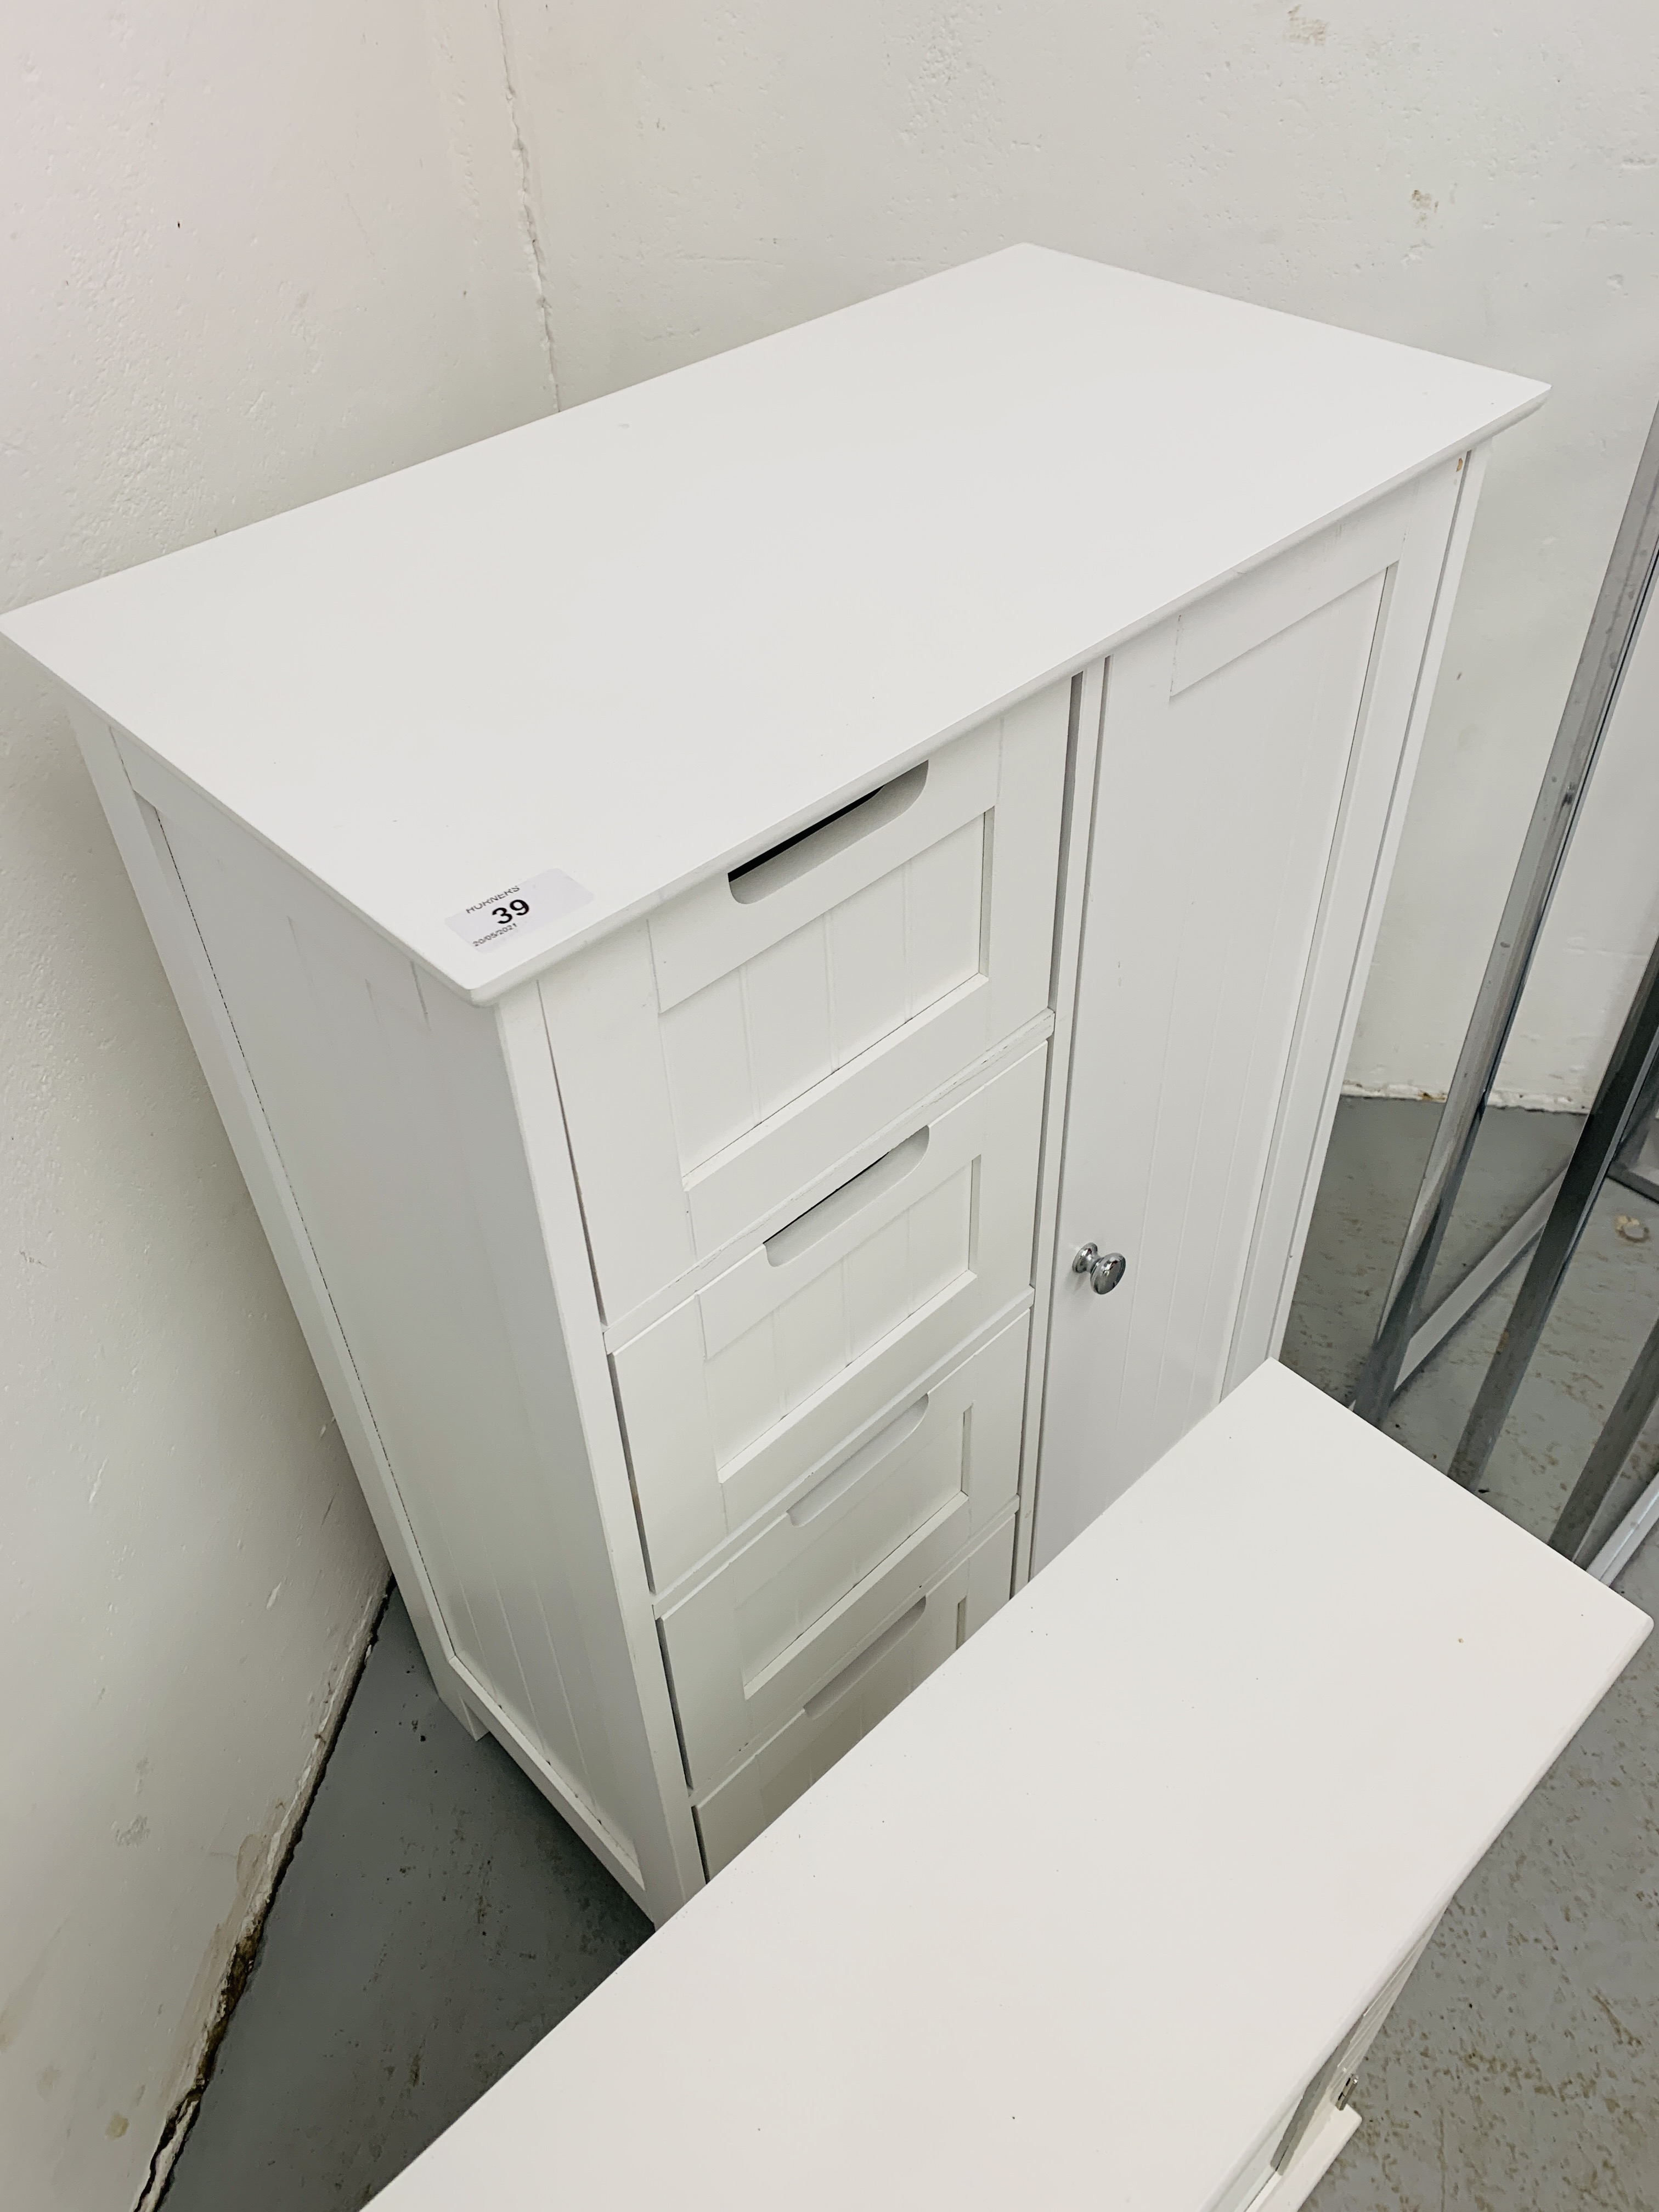 A MODERN WHITE FINISH FOUR DRAWER BATHROOM CABINET - W 56CM. D 30CM. H 81CM. - Image 4 of 4